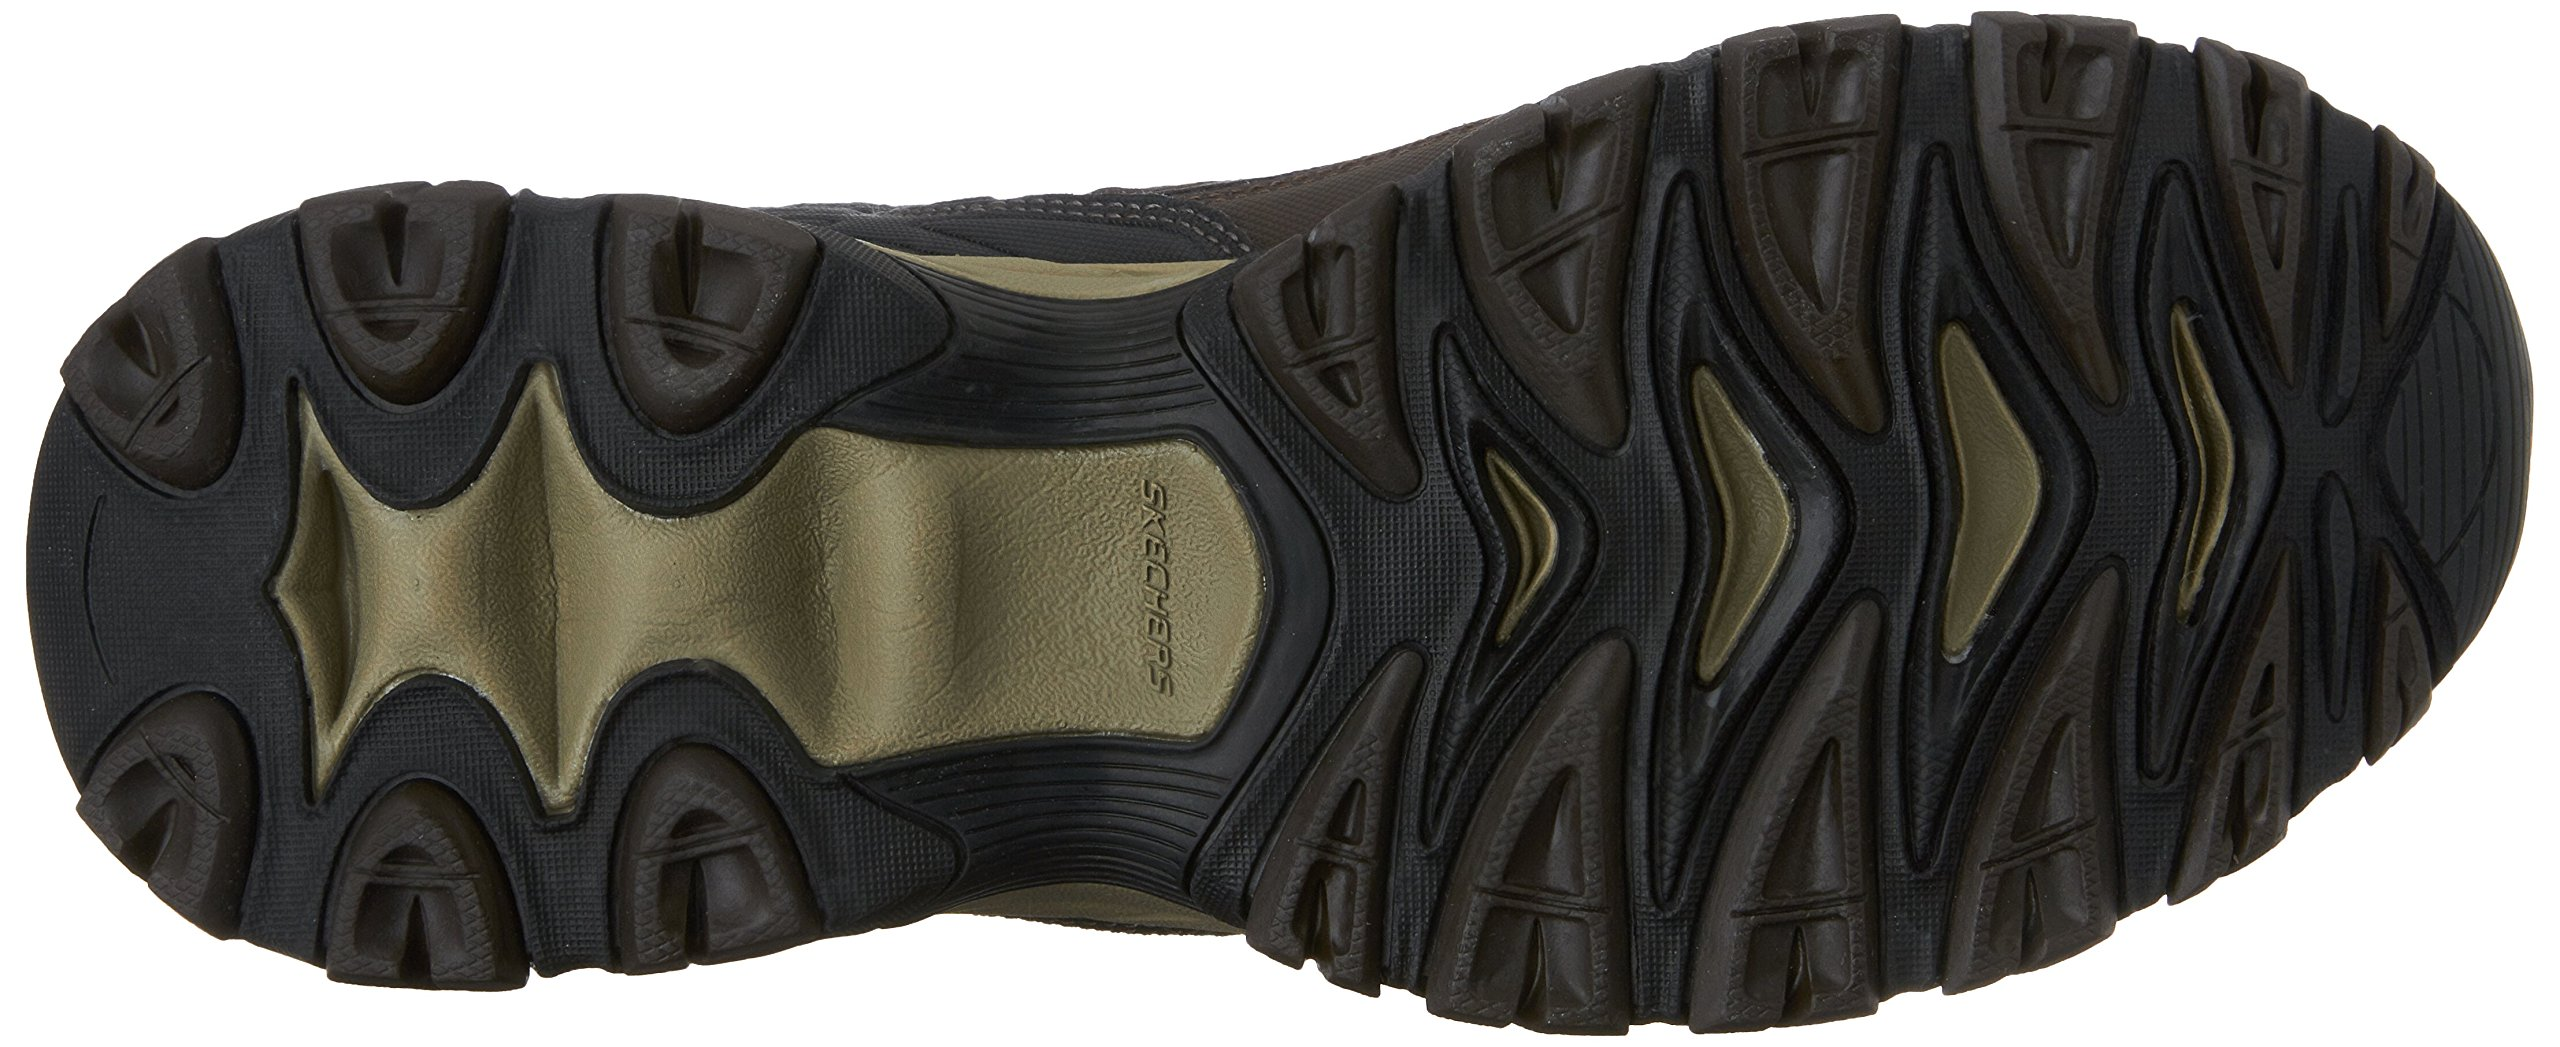 Skechers Men's AFTERBURNM.FIT Memory Foam Lace-Up Sneaker, Brown/Taupe, 7.5 M US by Skechers (Image #3)